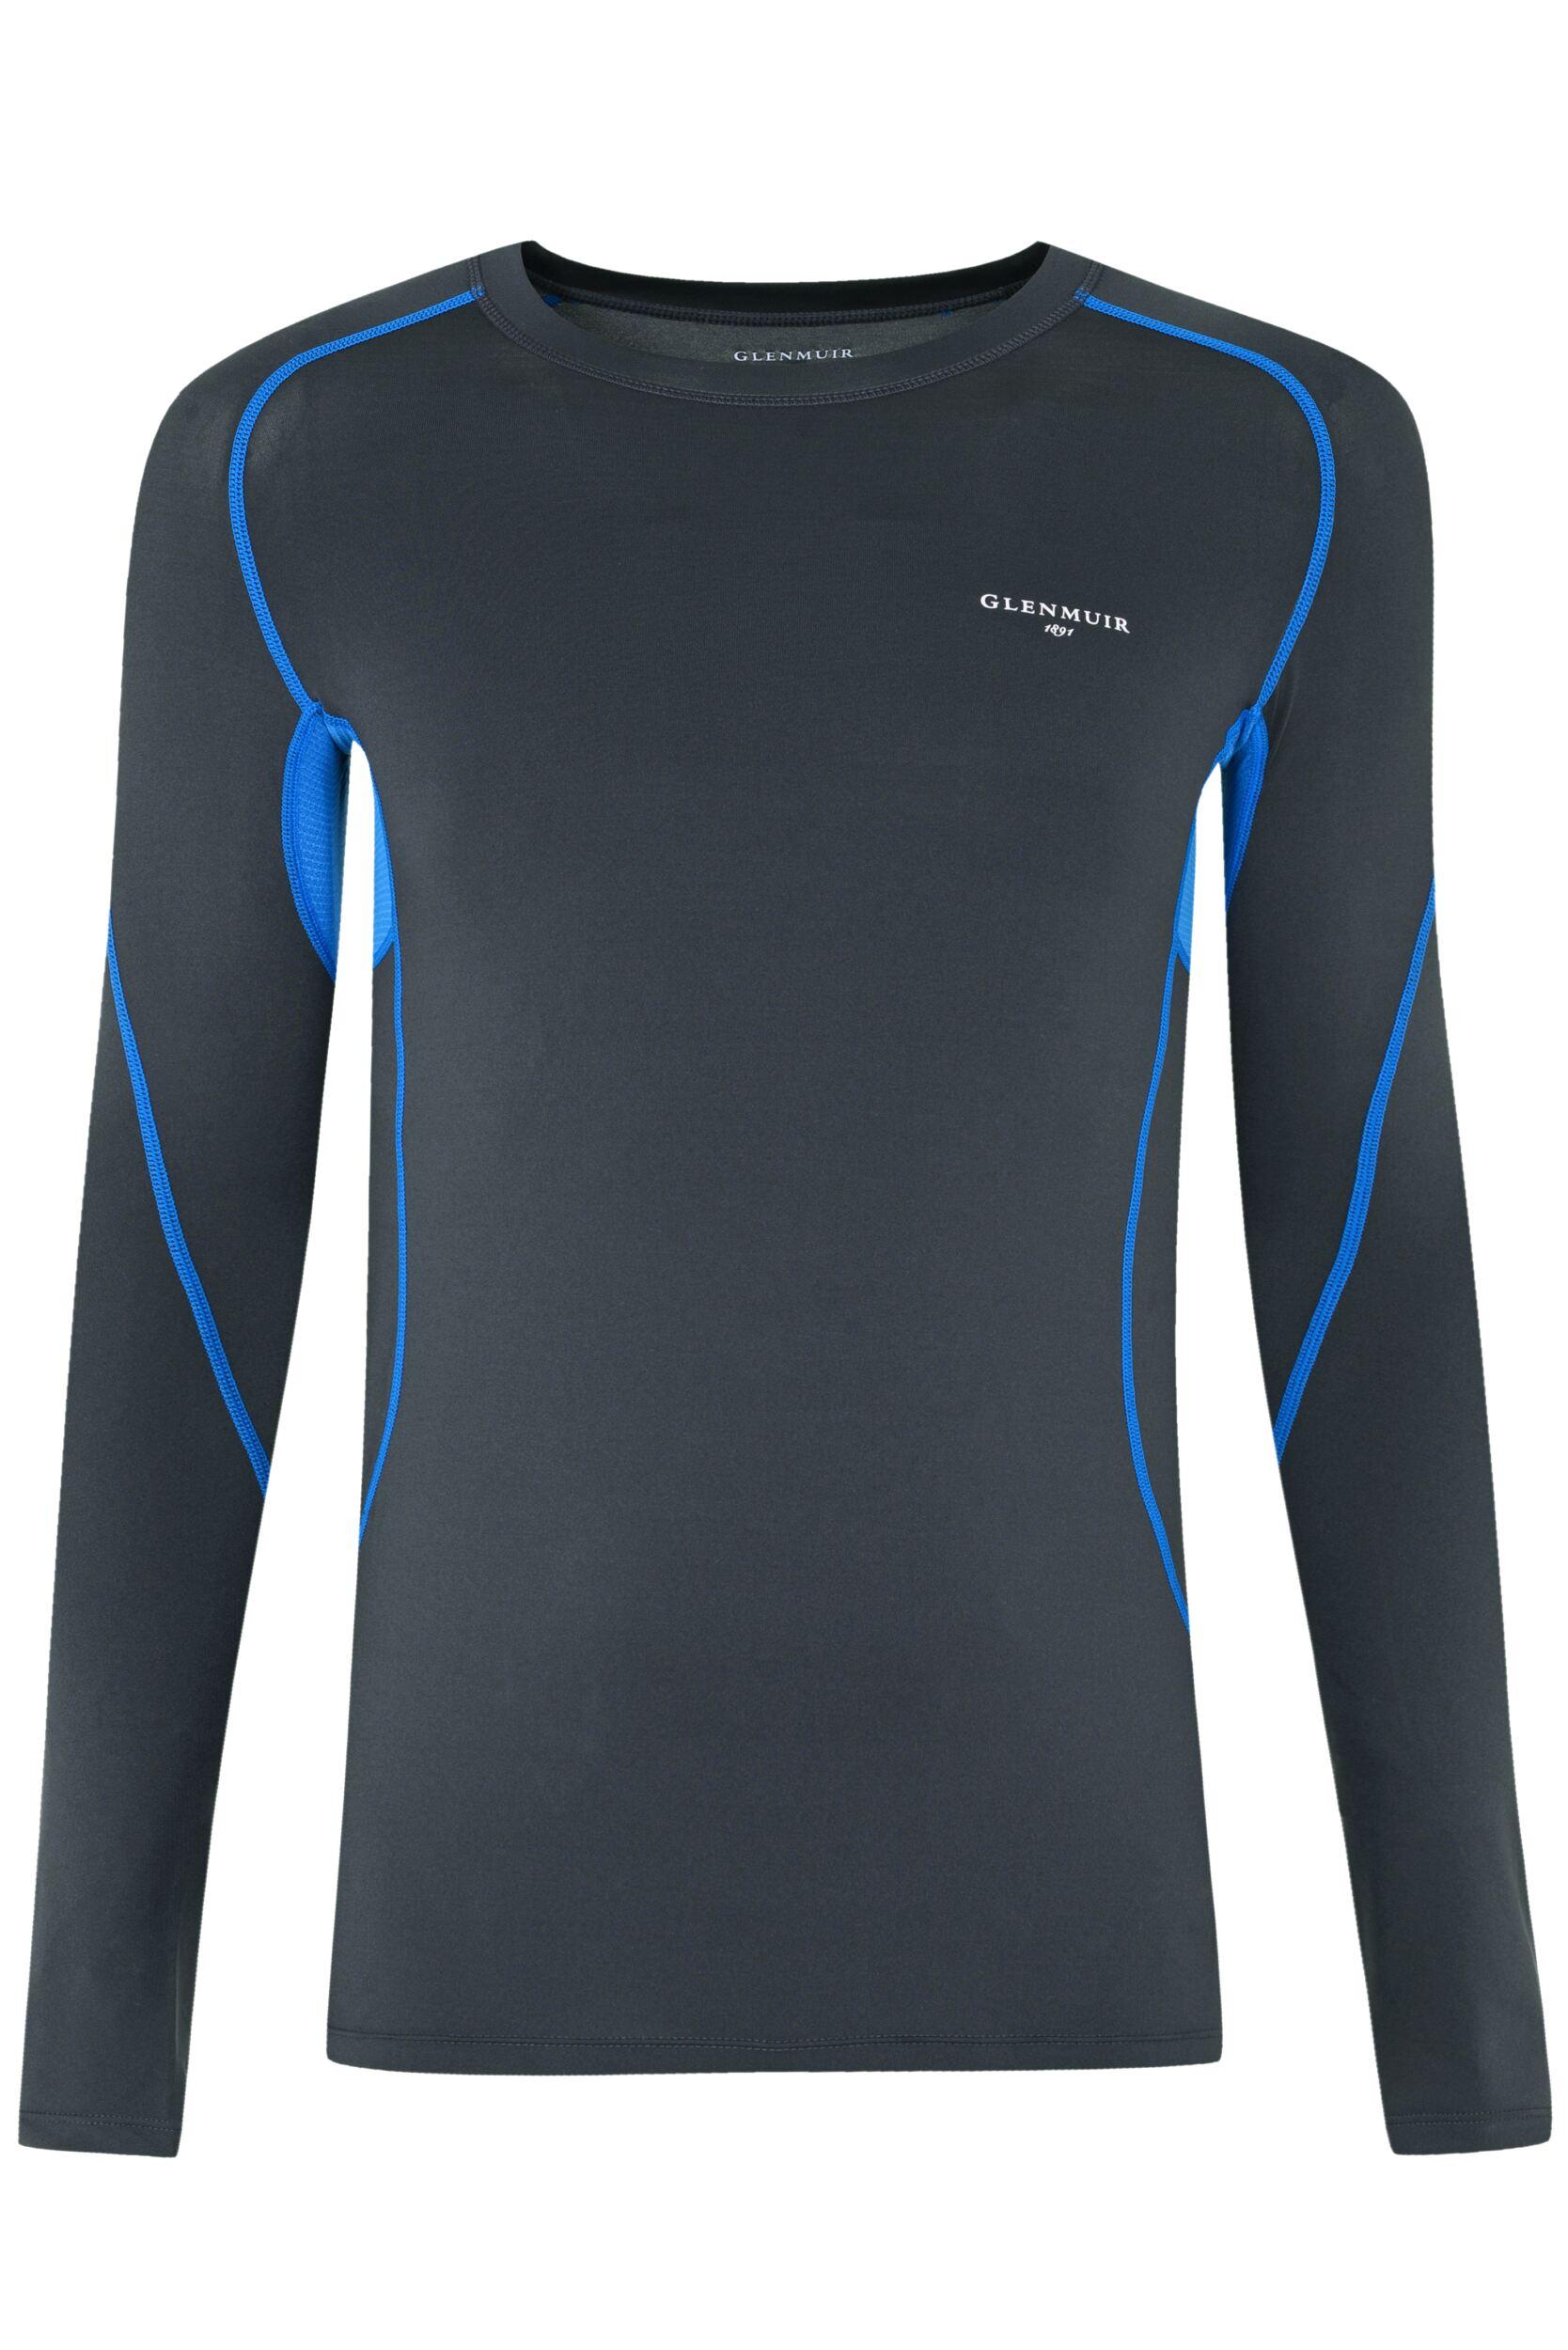 Image of Mens 1 Pack Glenmuir Long Sleeved Compression Base Layer T-Shirt